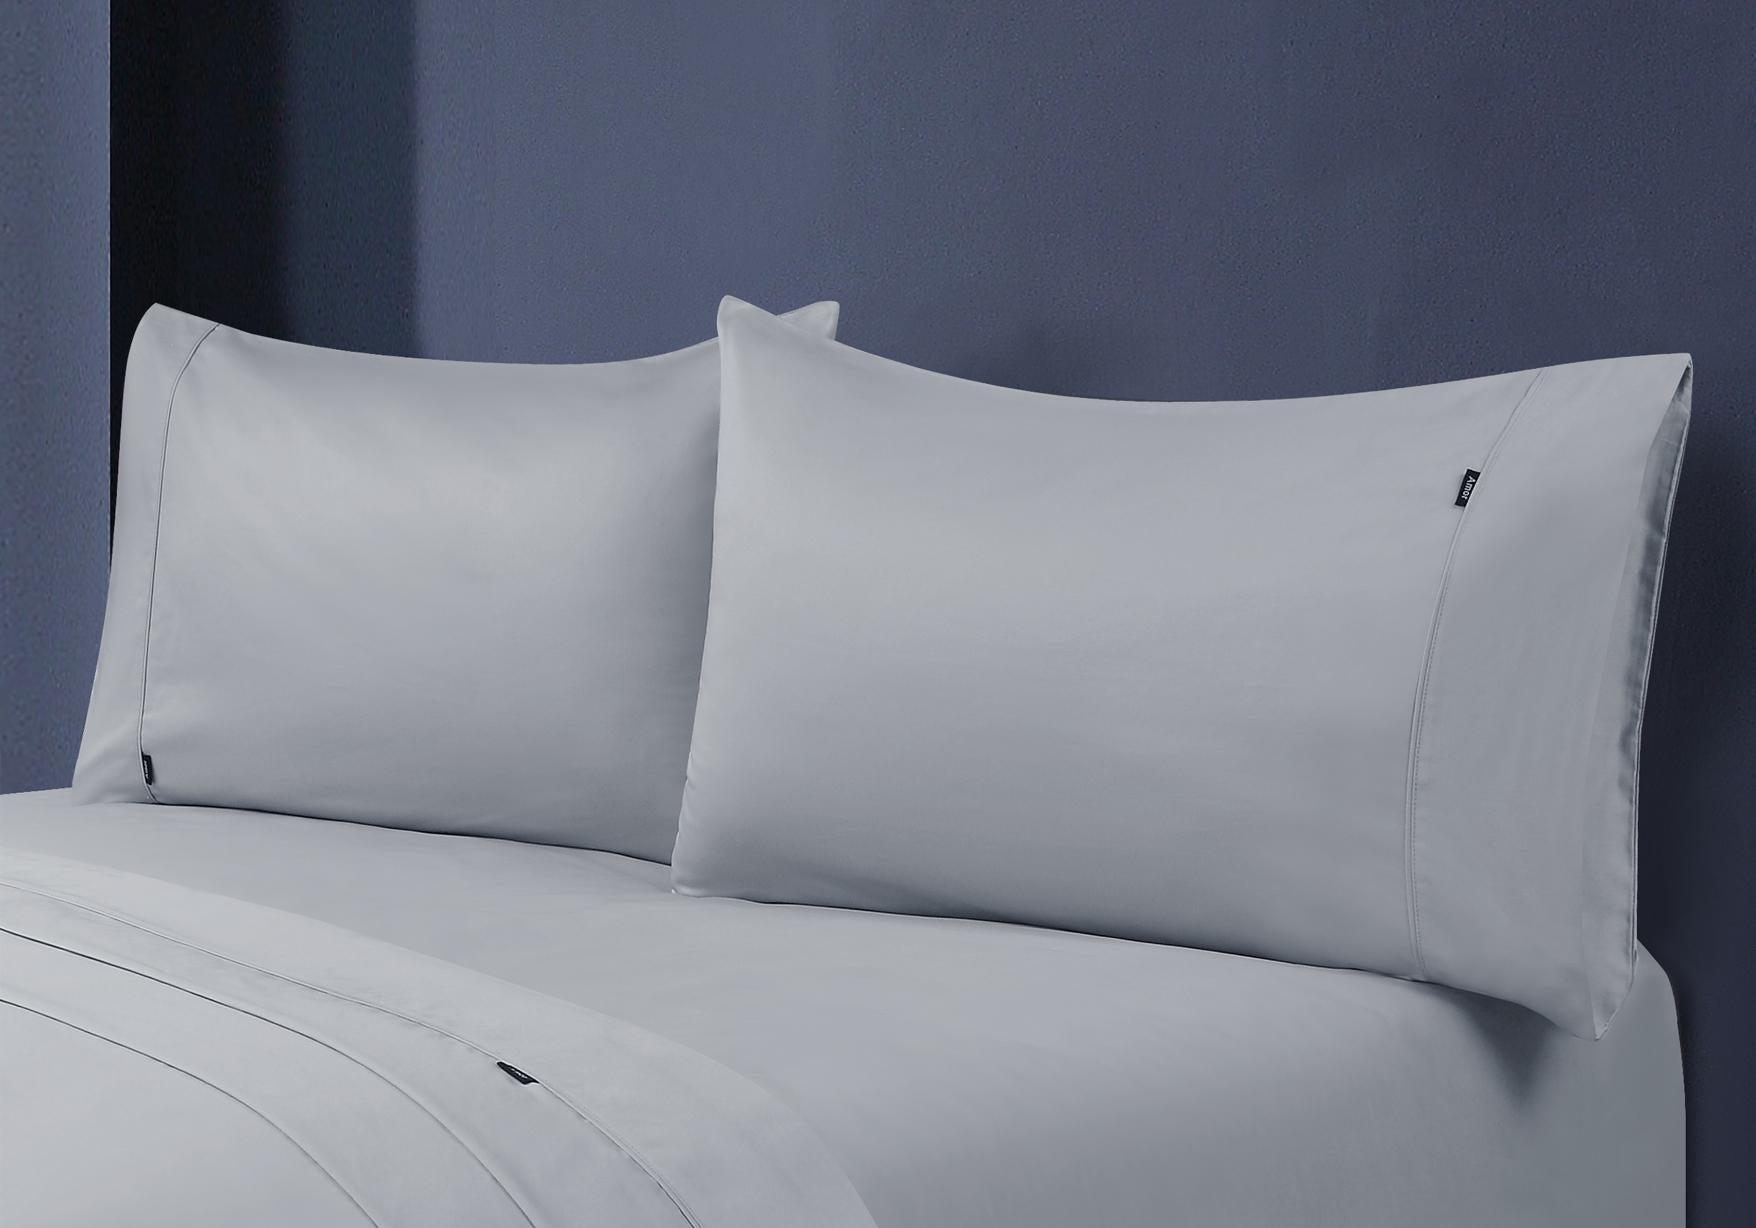 1000TC Australian 1 Fitted Sheet 2 Pillow Case 100/%Egyptian Cotton